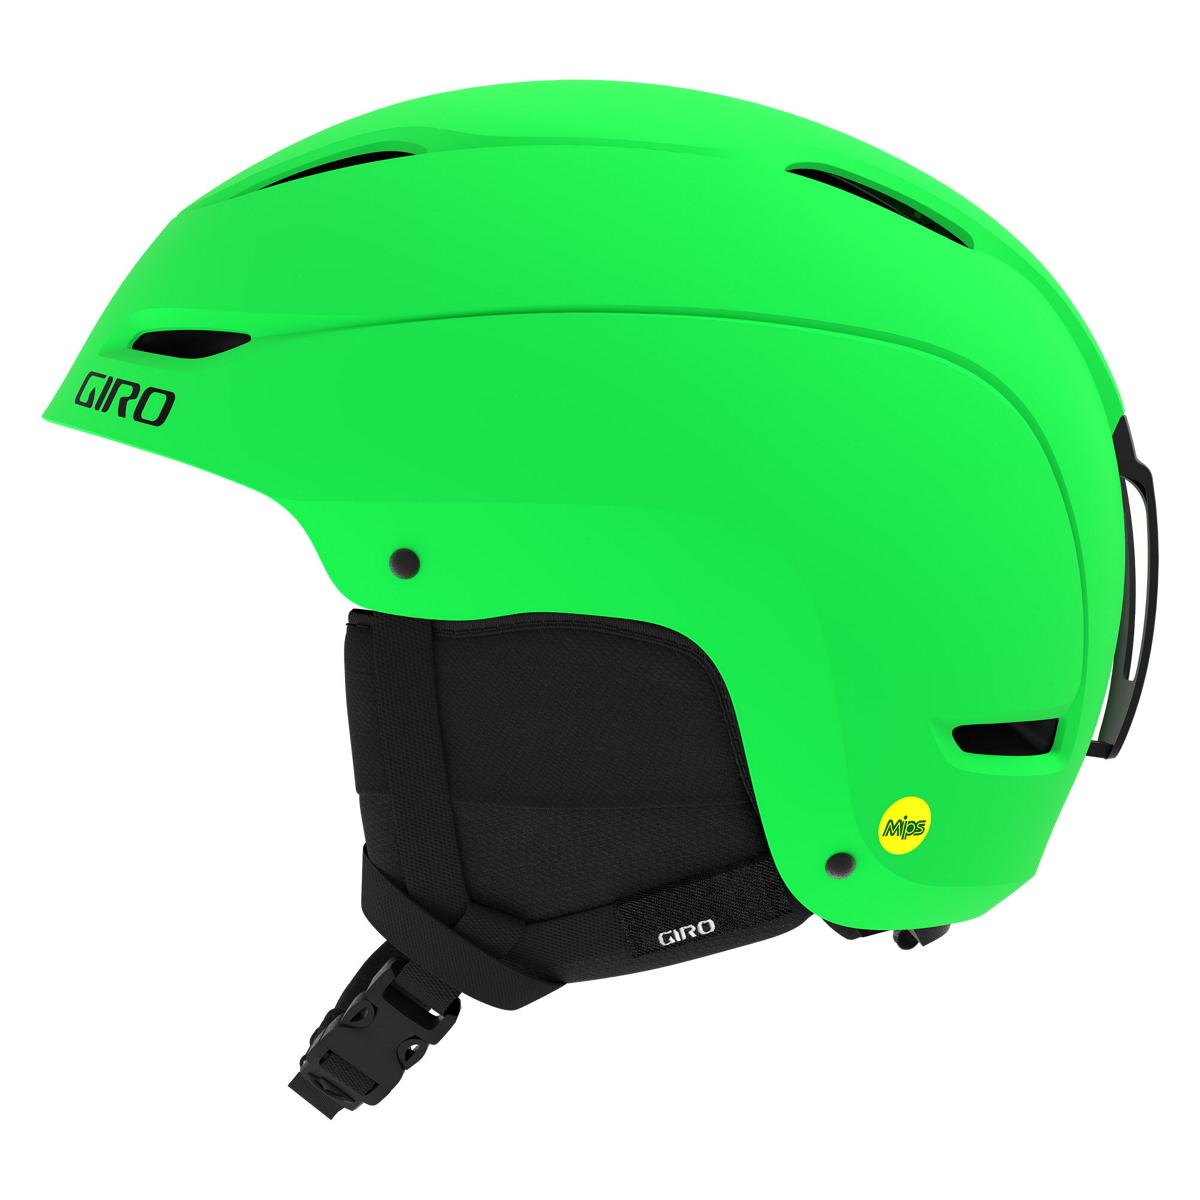 Giro Ratio MIPS Helmet - Matte Bright Green